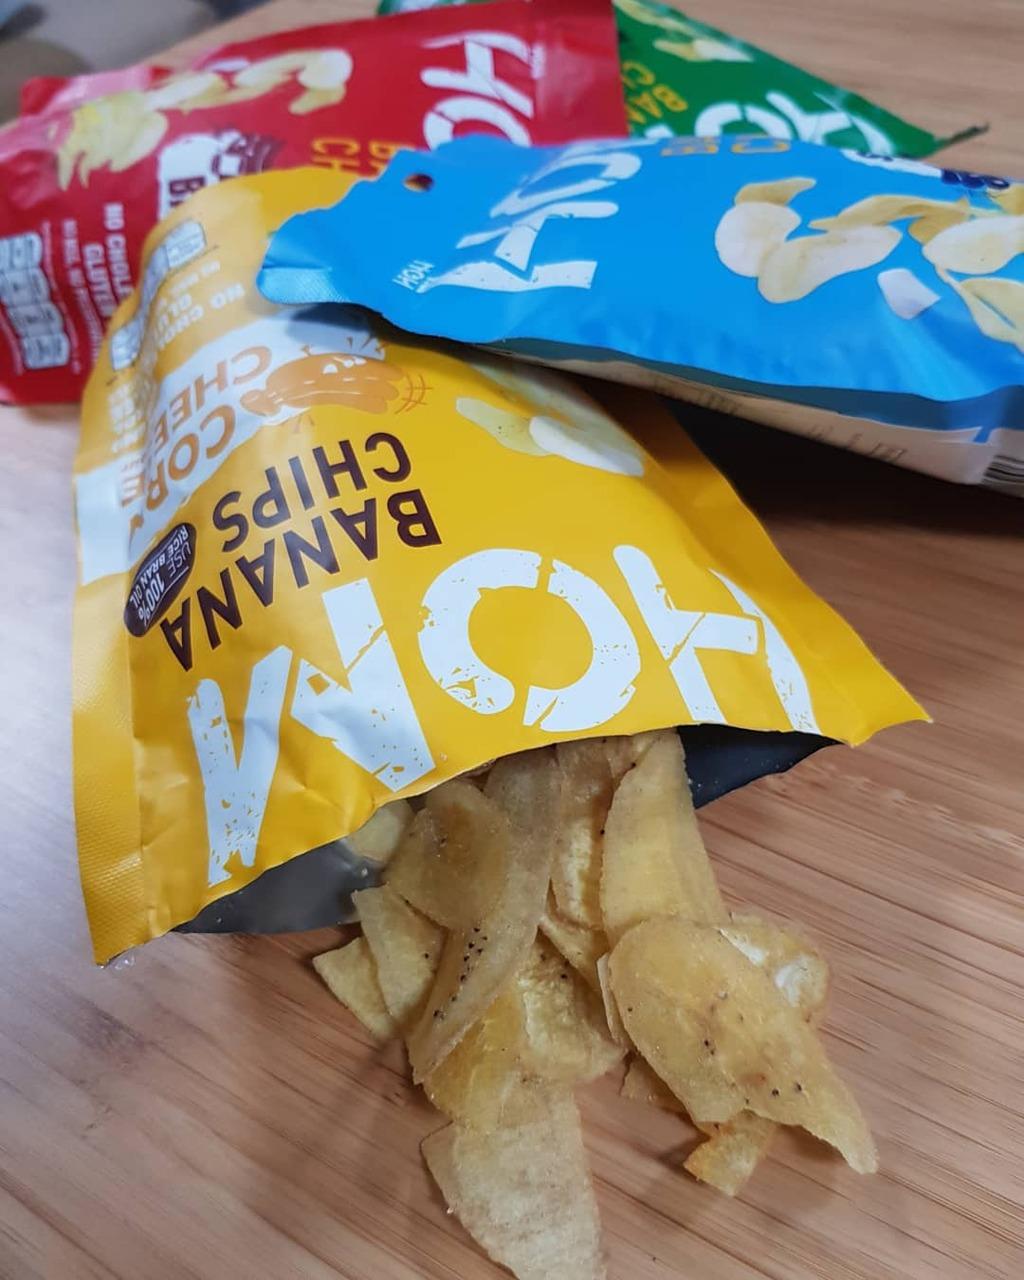 Hom Banana Chips กล้วยหอมทองแผ่นกรอบอร่อย